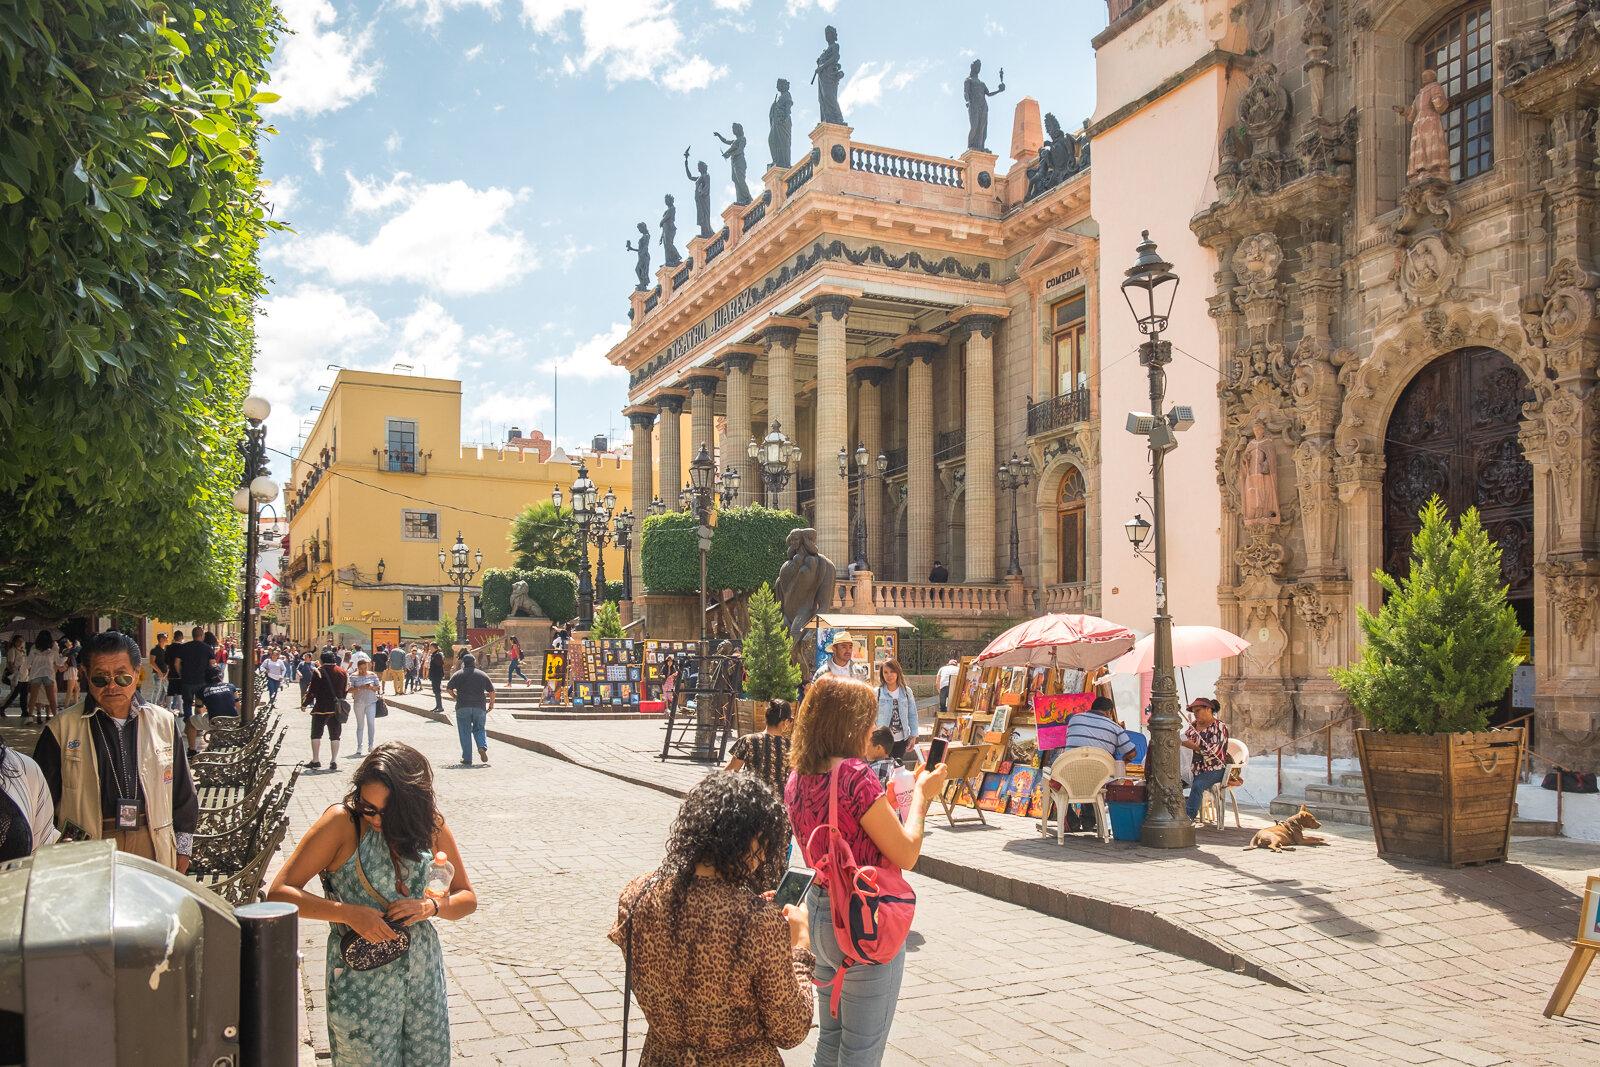 2019.10.8_Mexico_Guanajuato1_Britt first year.jpg